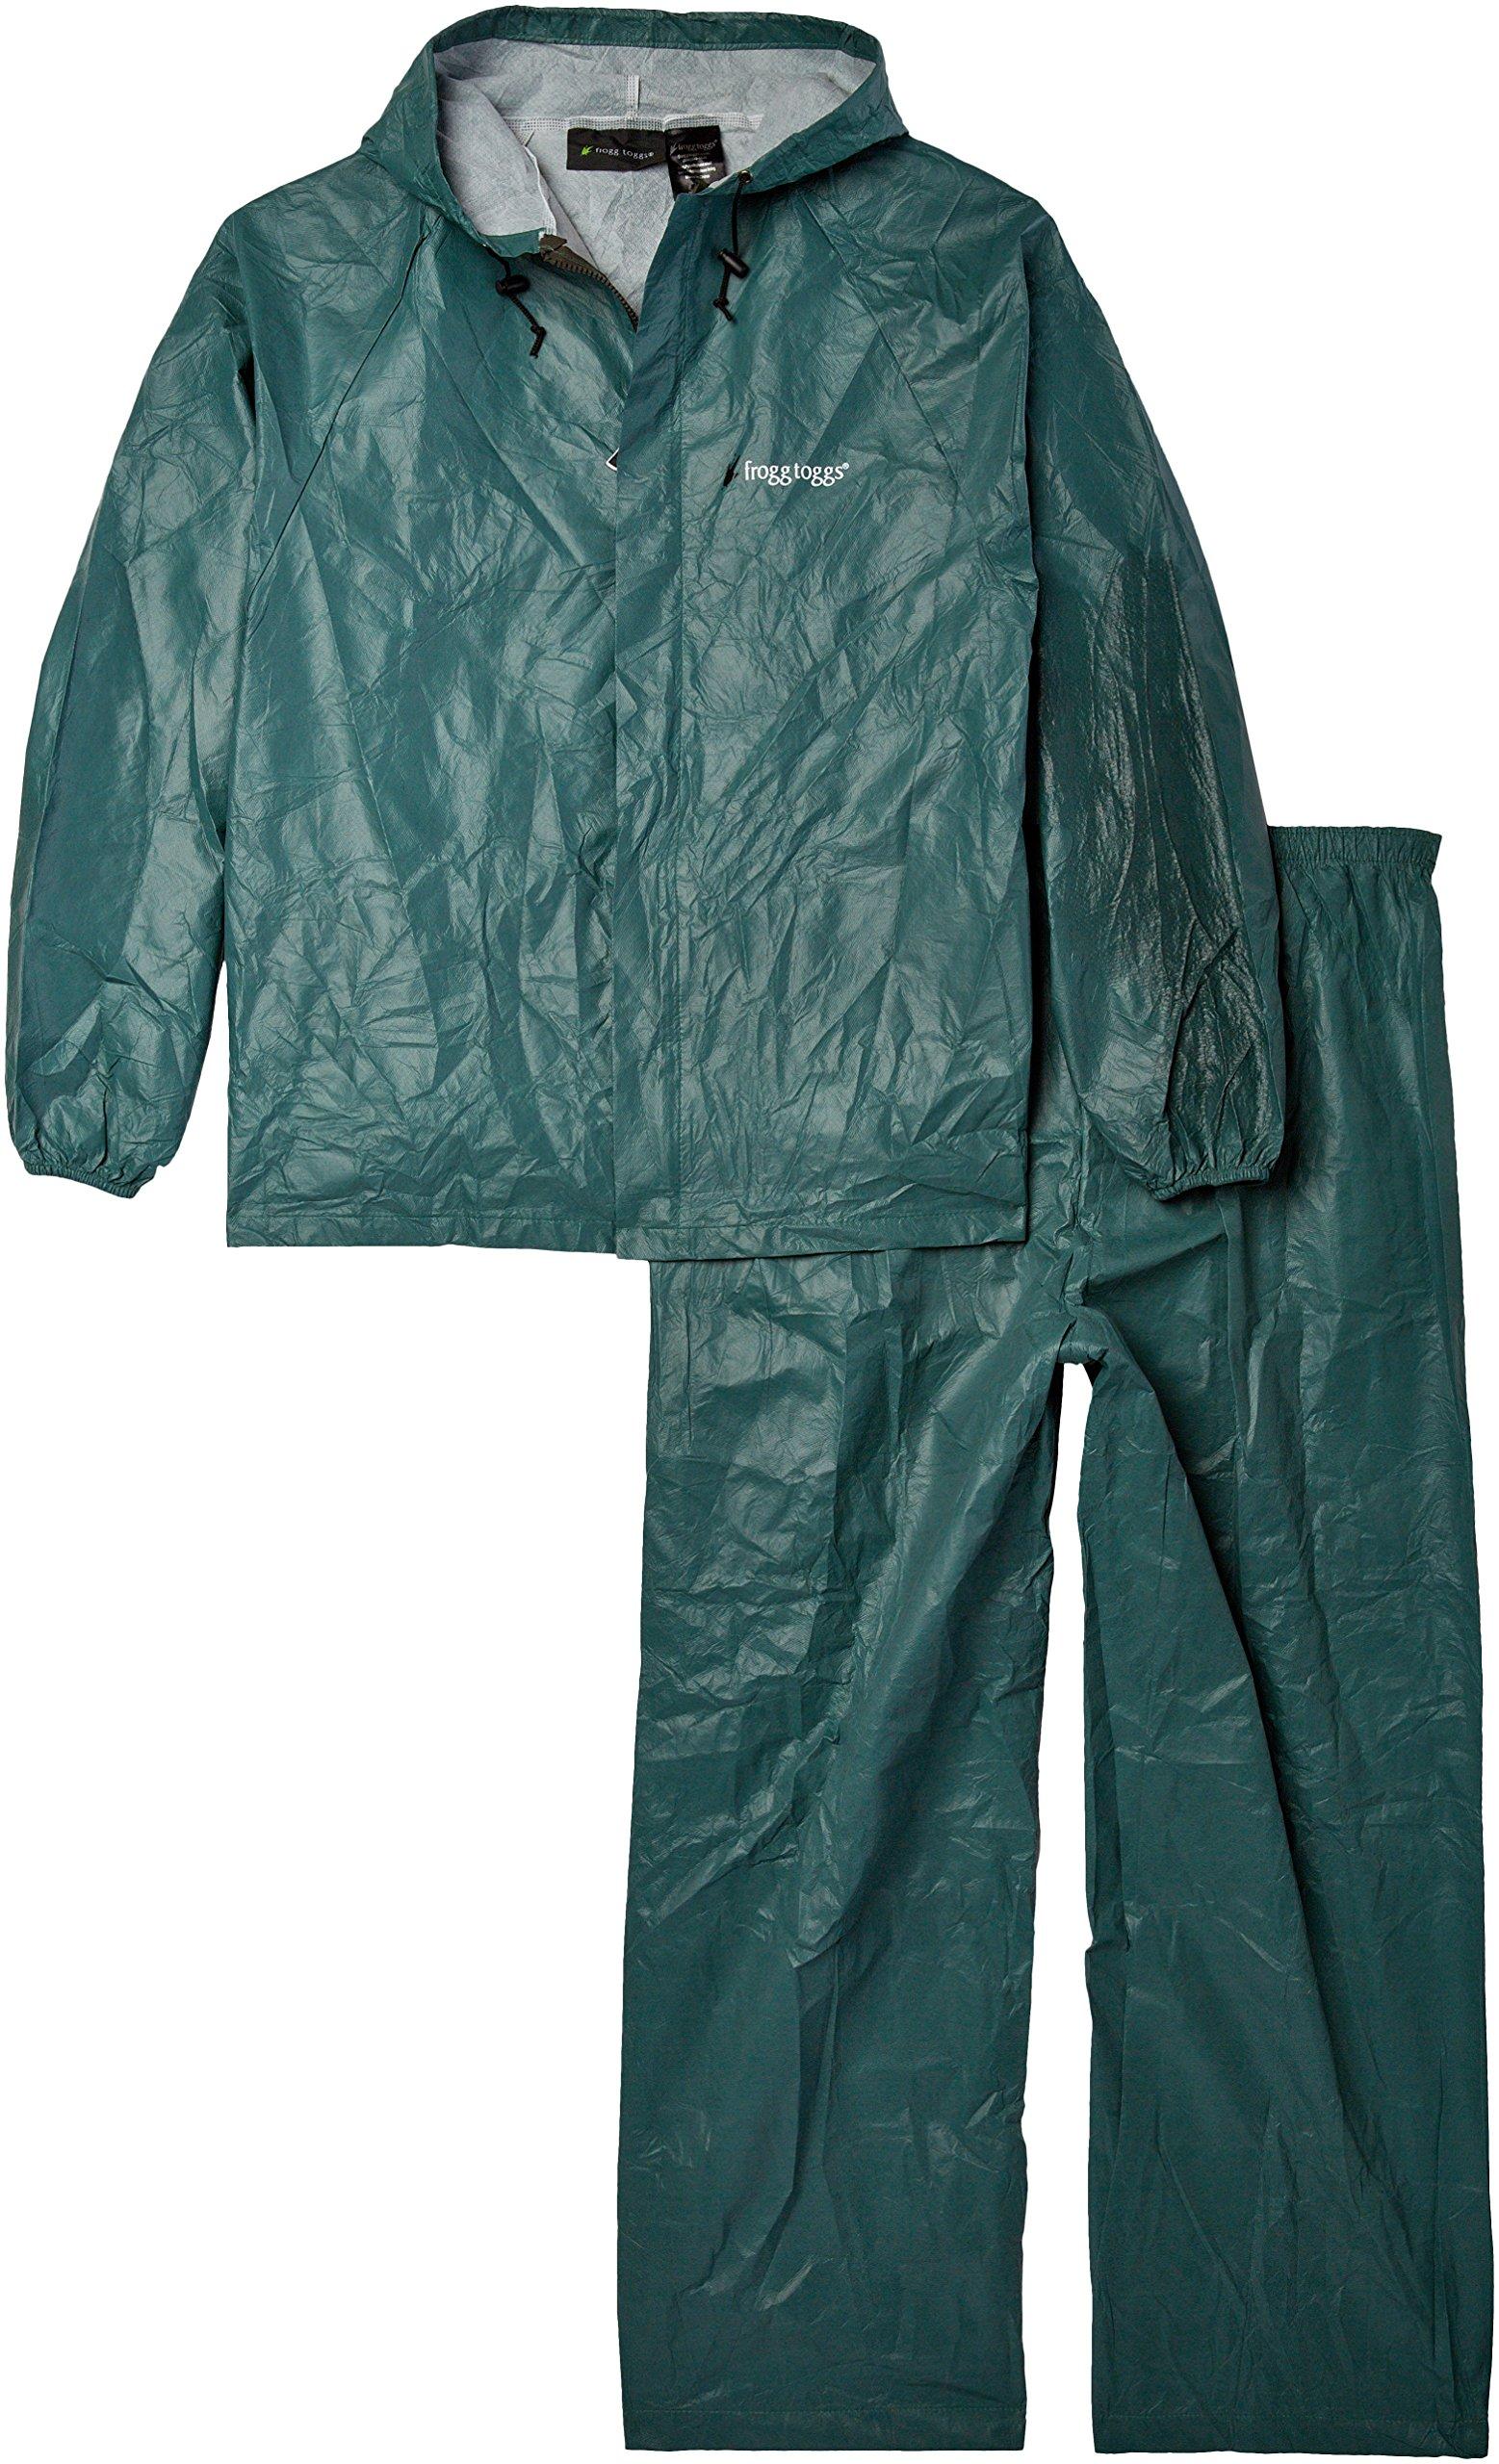 Frogg Toggs Men's Waterproof Ultra-Lite2 Suit, Forest Green, L